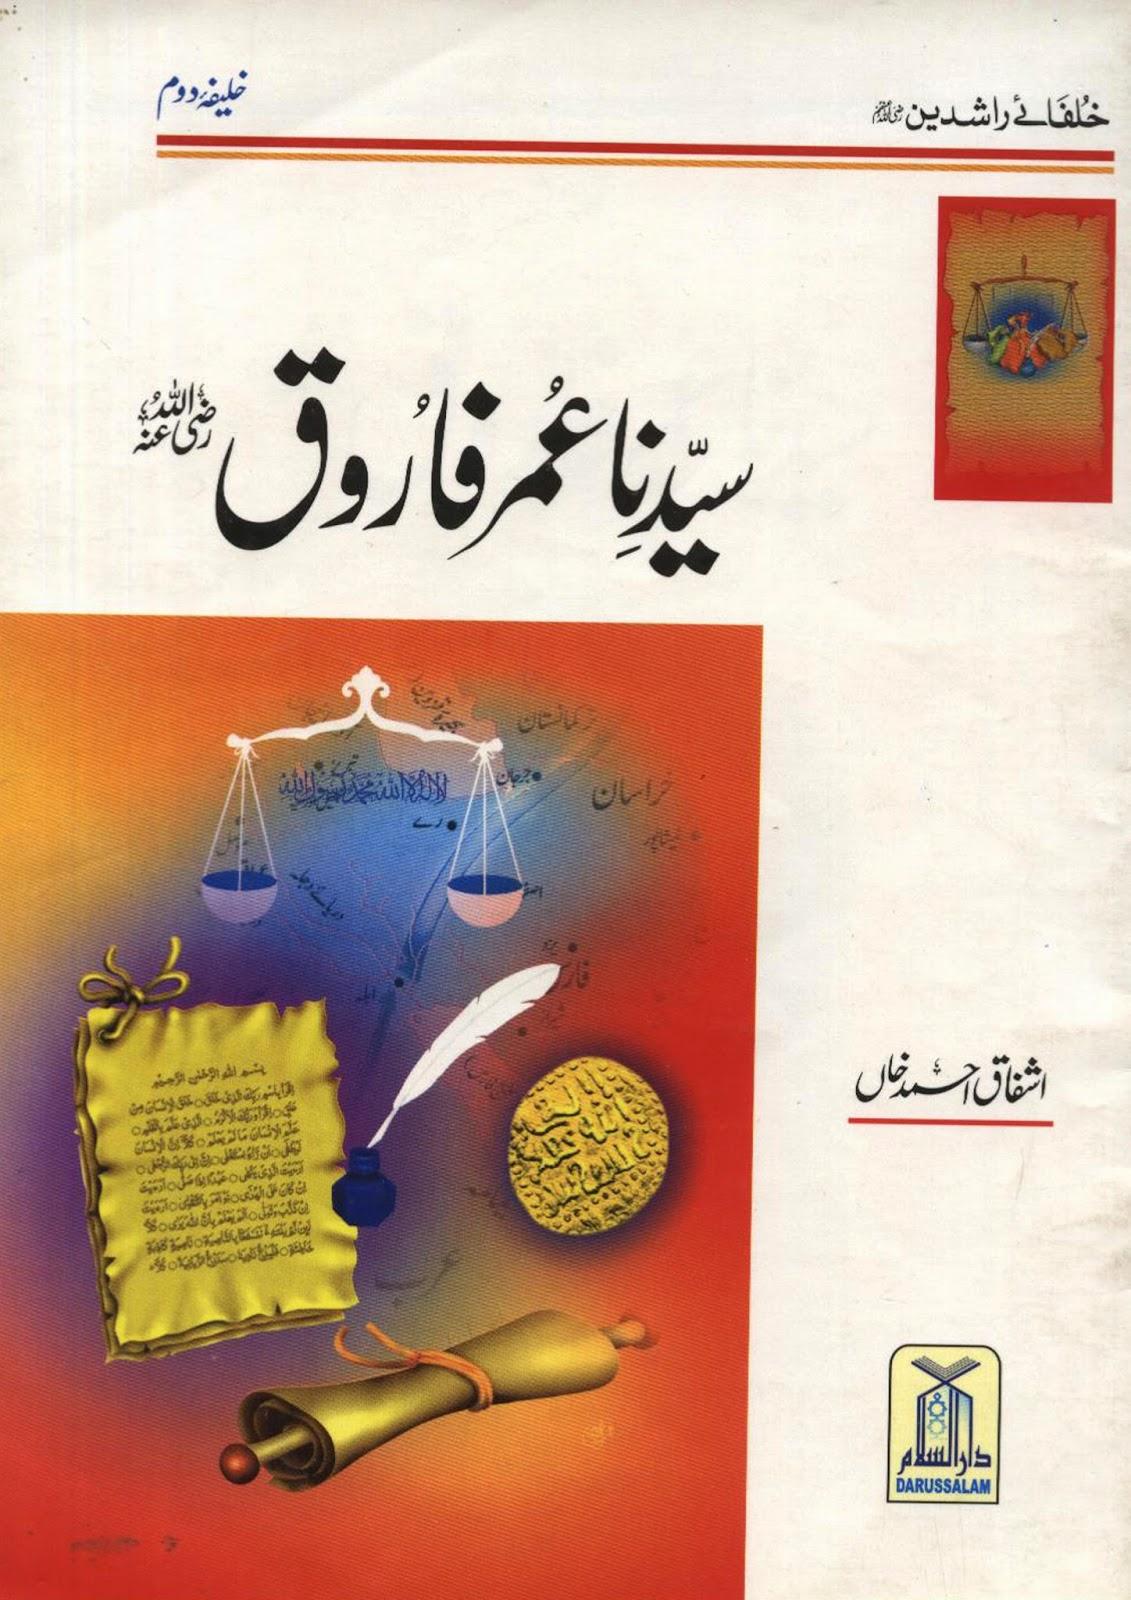 http://urduguru1.blogspot.com/2014/02/khalifa-e-doem-abu-umar-farooq-razi.html